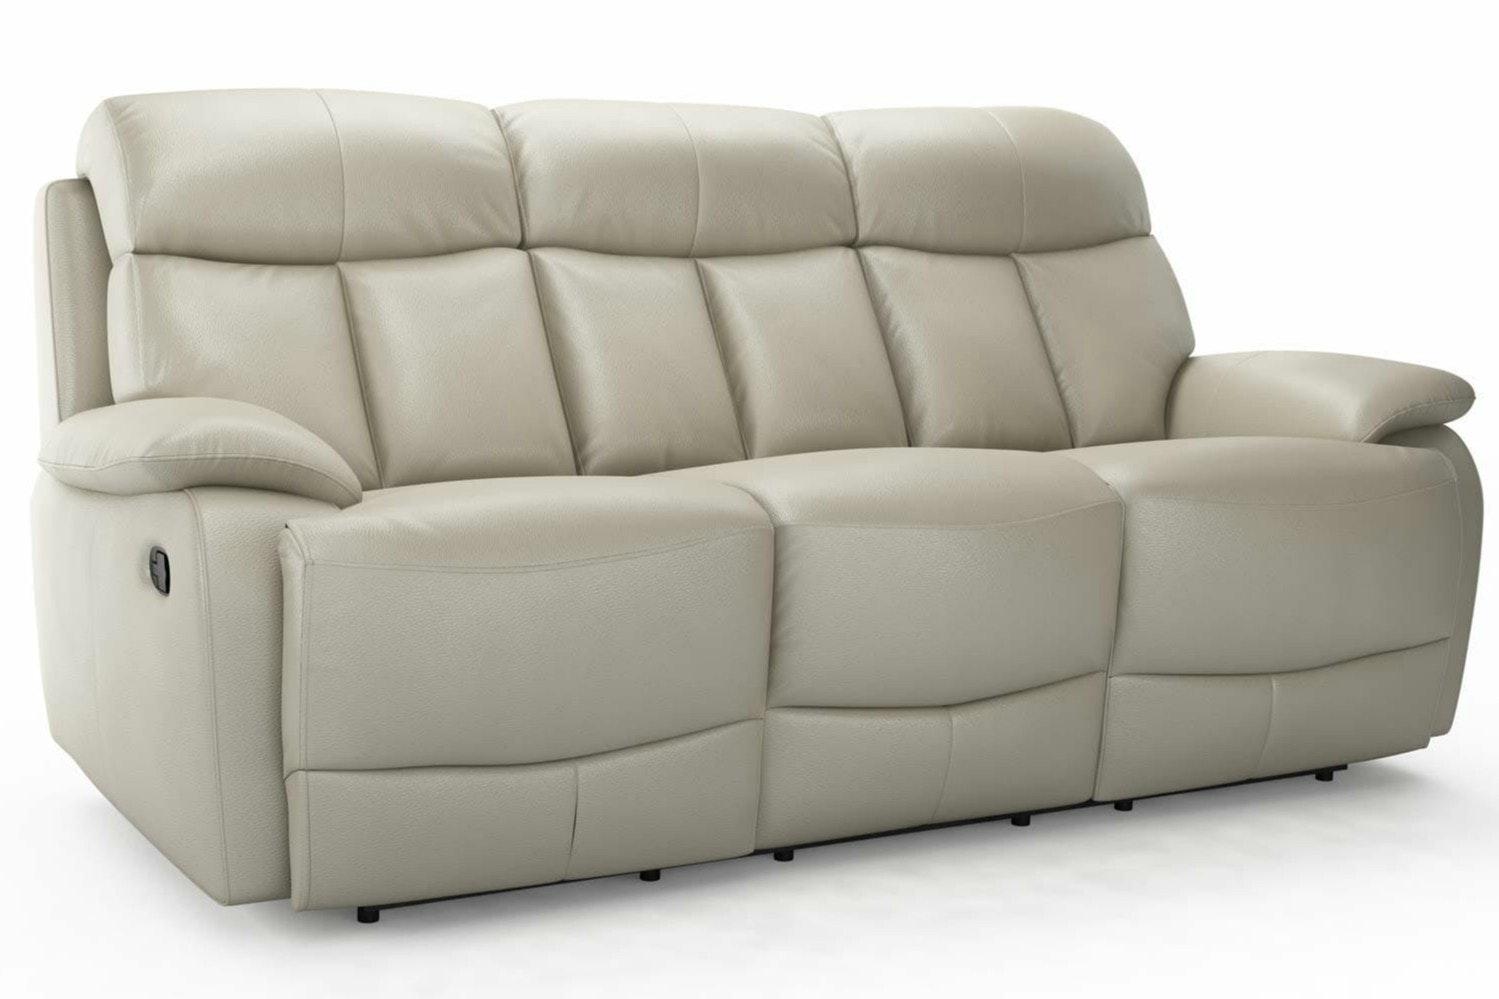 Seline 3 Seater Leather Recliner Sofa ...  sc 1 st  Harvey Norman & Seline 3 Seater Leather Recliner Sofa | Ireland islam-shia.org